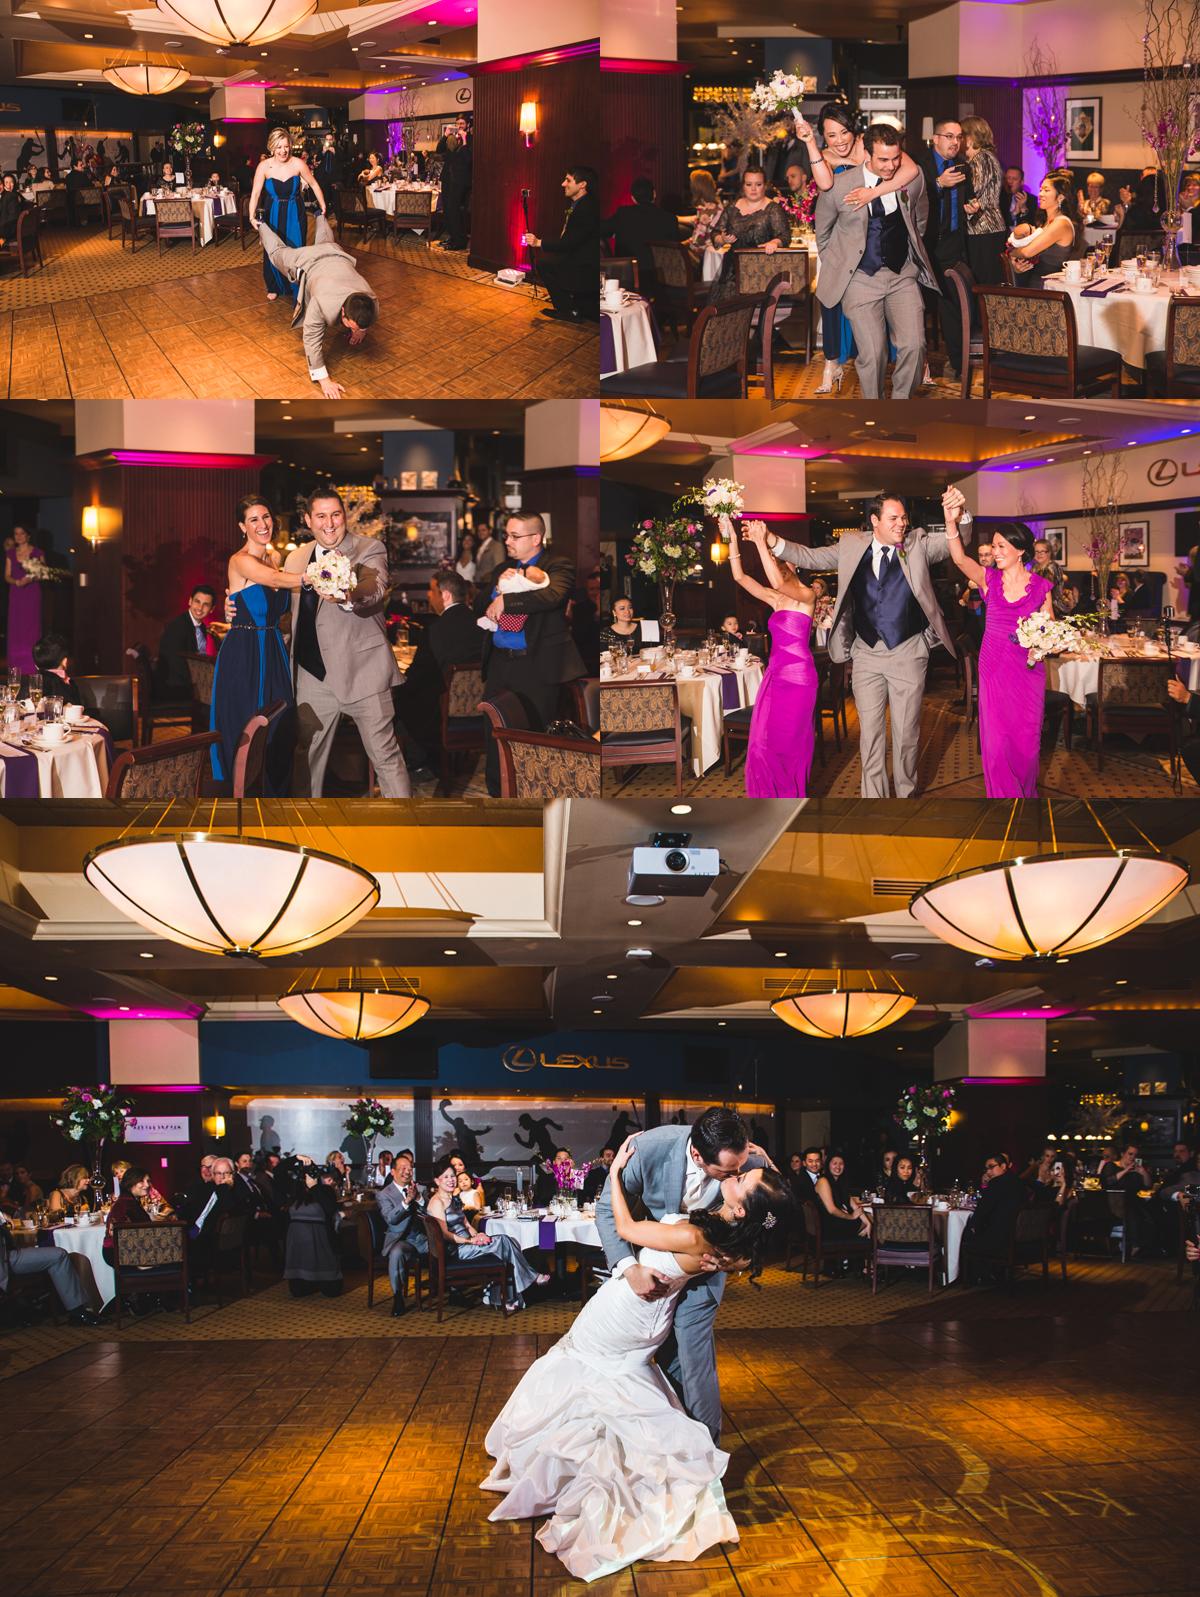 pittsburgh-wedding-photographer-kimly-james-heinz-chapel-pnc-lexus-club-tea-ceremony-17